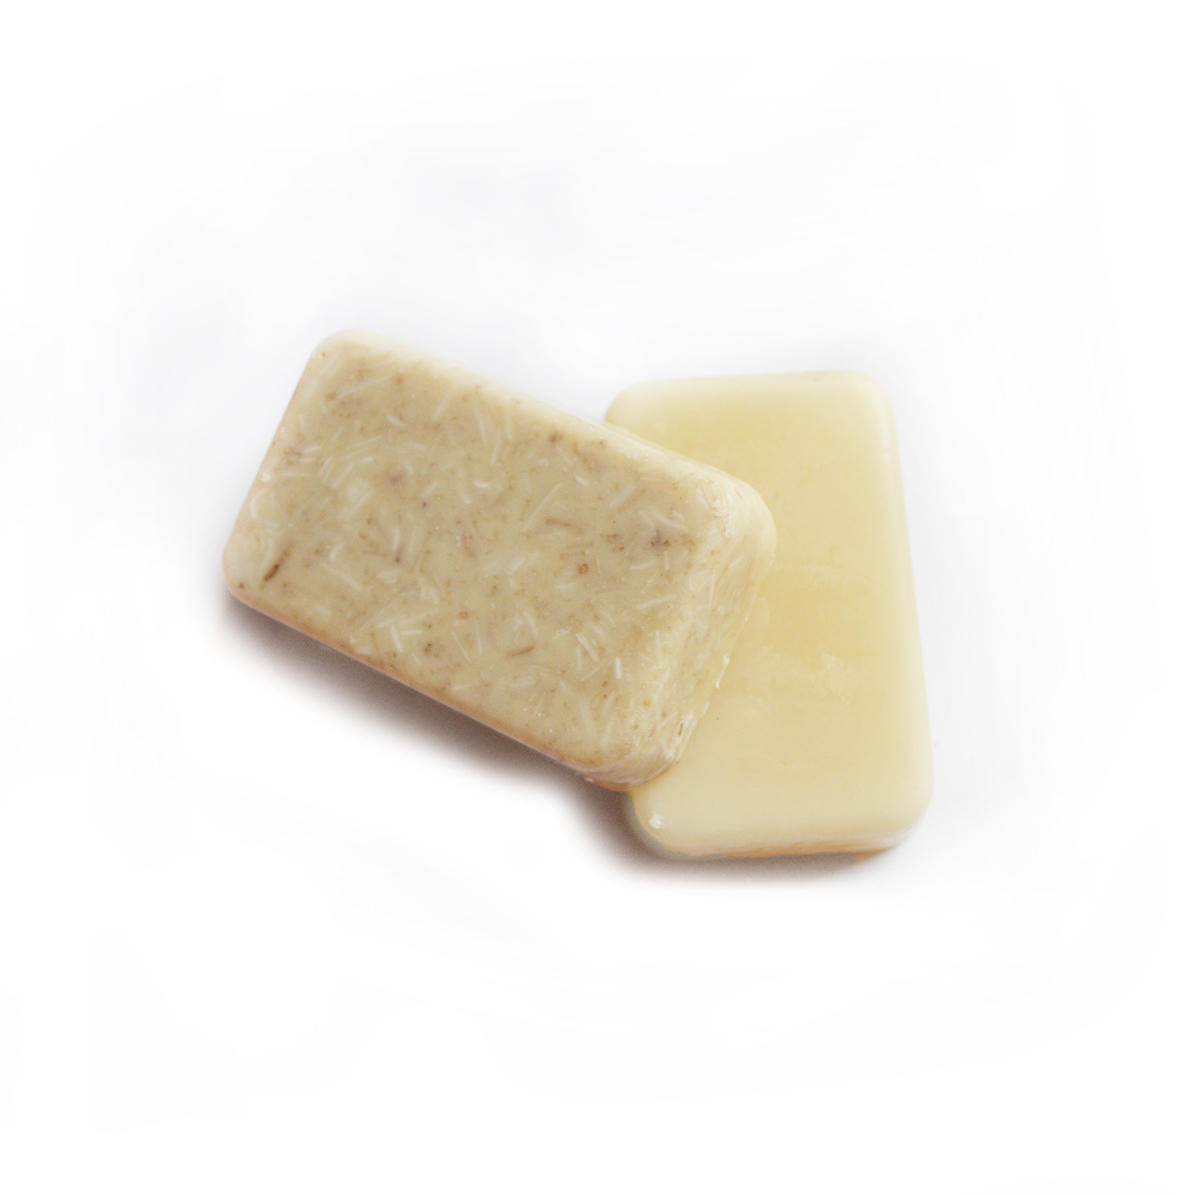 Argan Oil Simply Good™ Vegan Shampoo & Conditioner Bar Set 01021